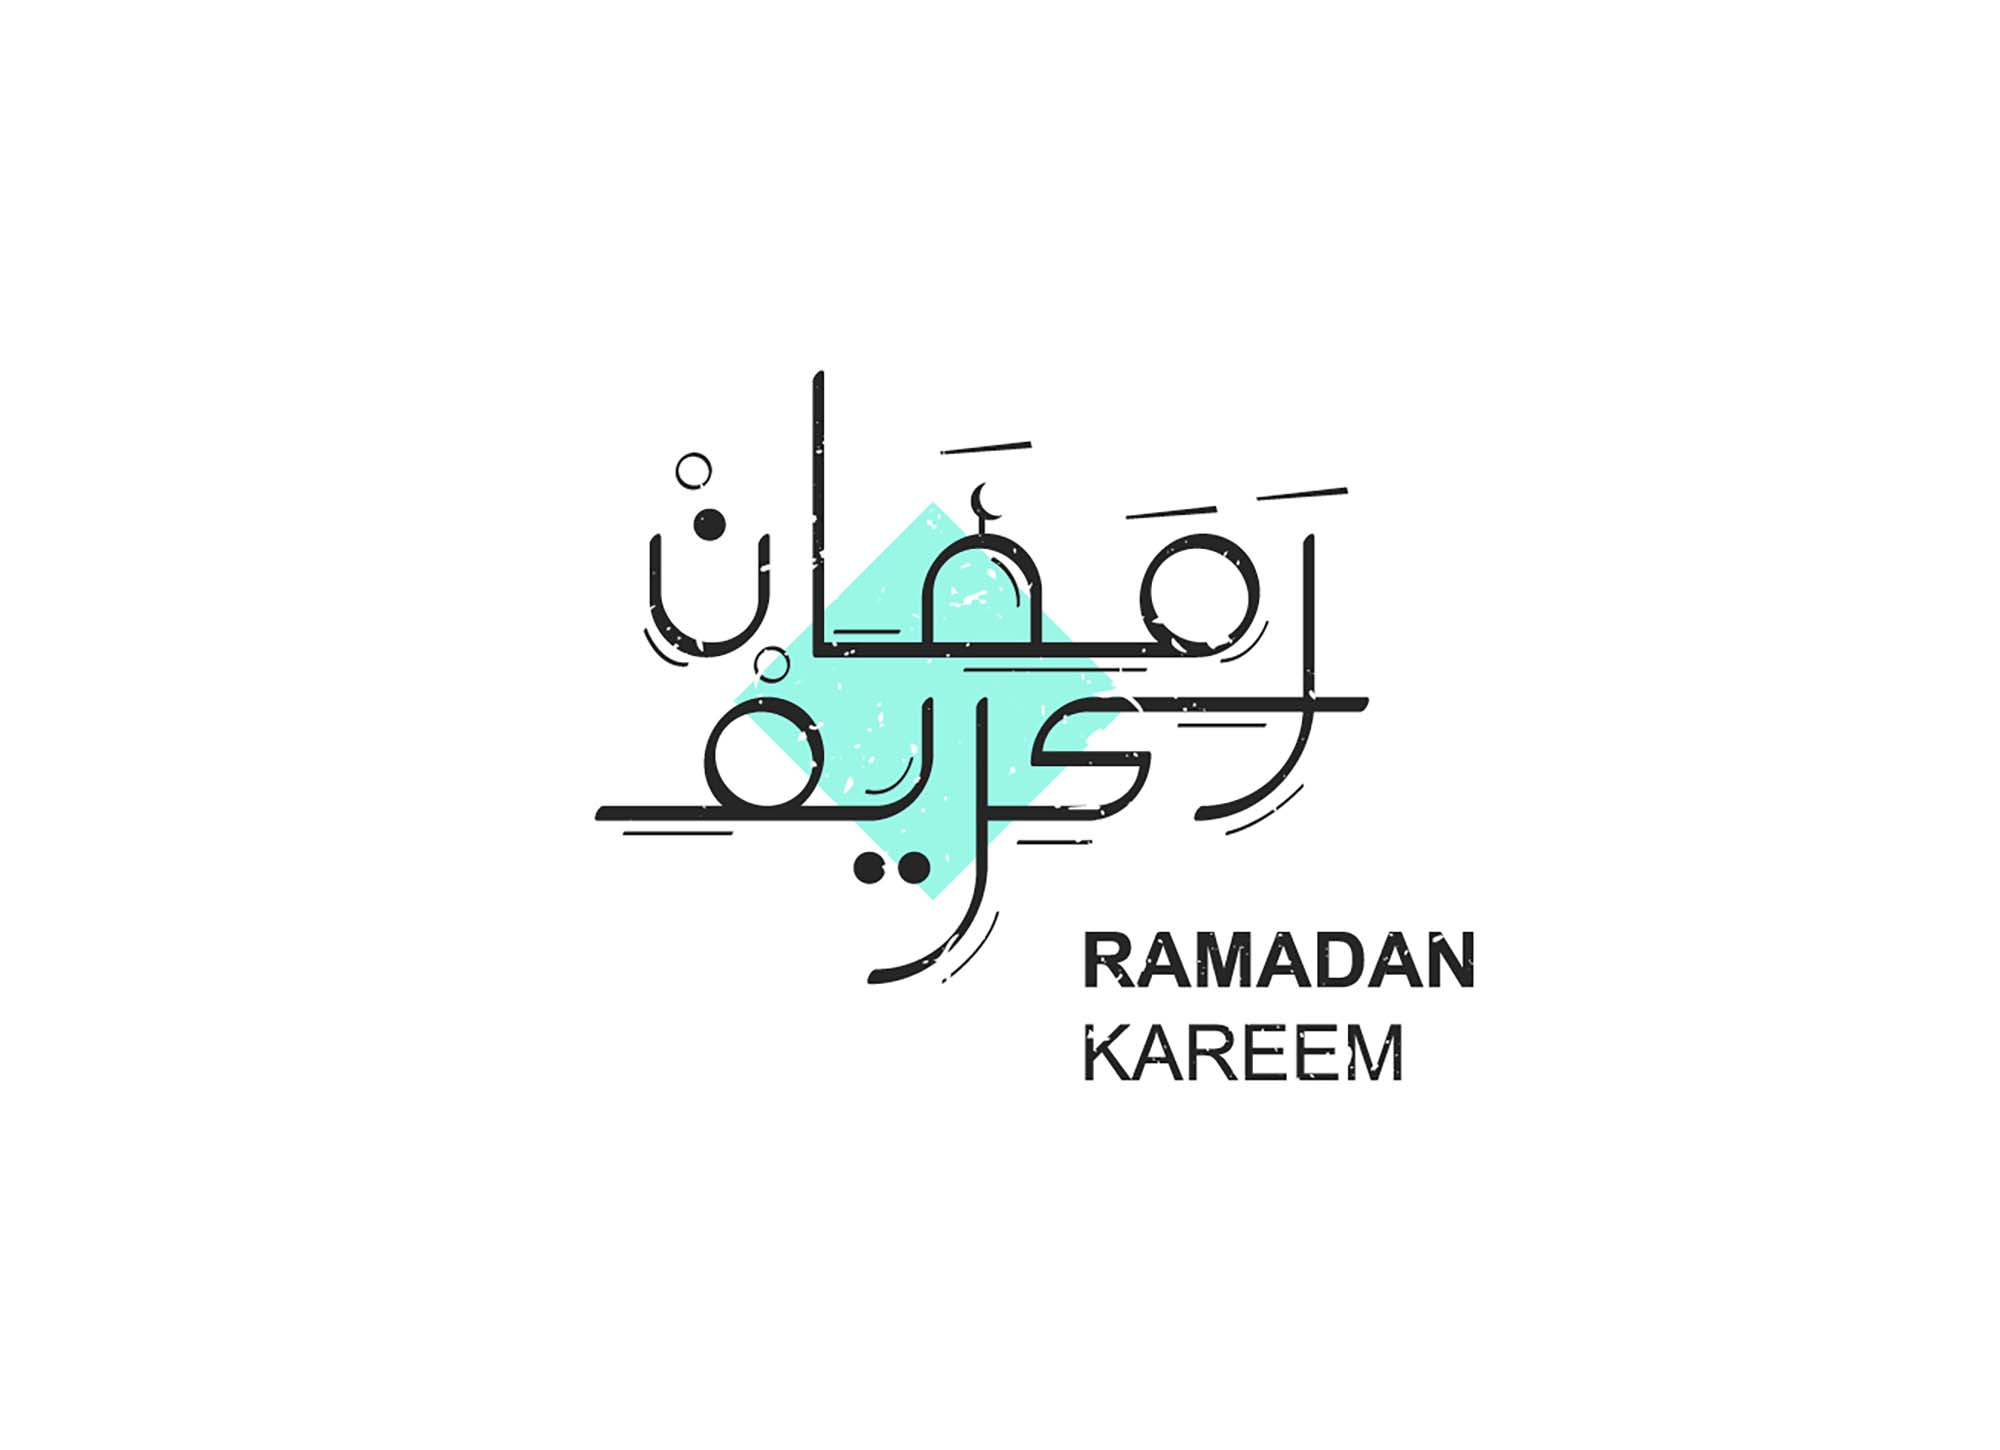 Ramadan Typography Logo Templates 4Ramadan Typography Logo Templates 4